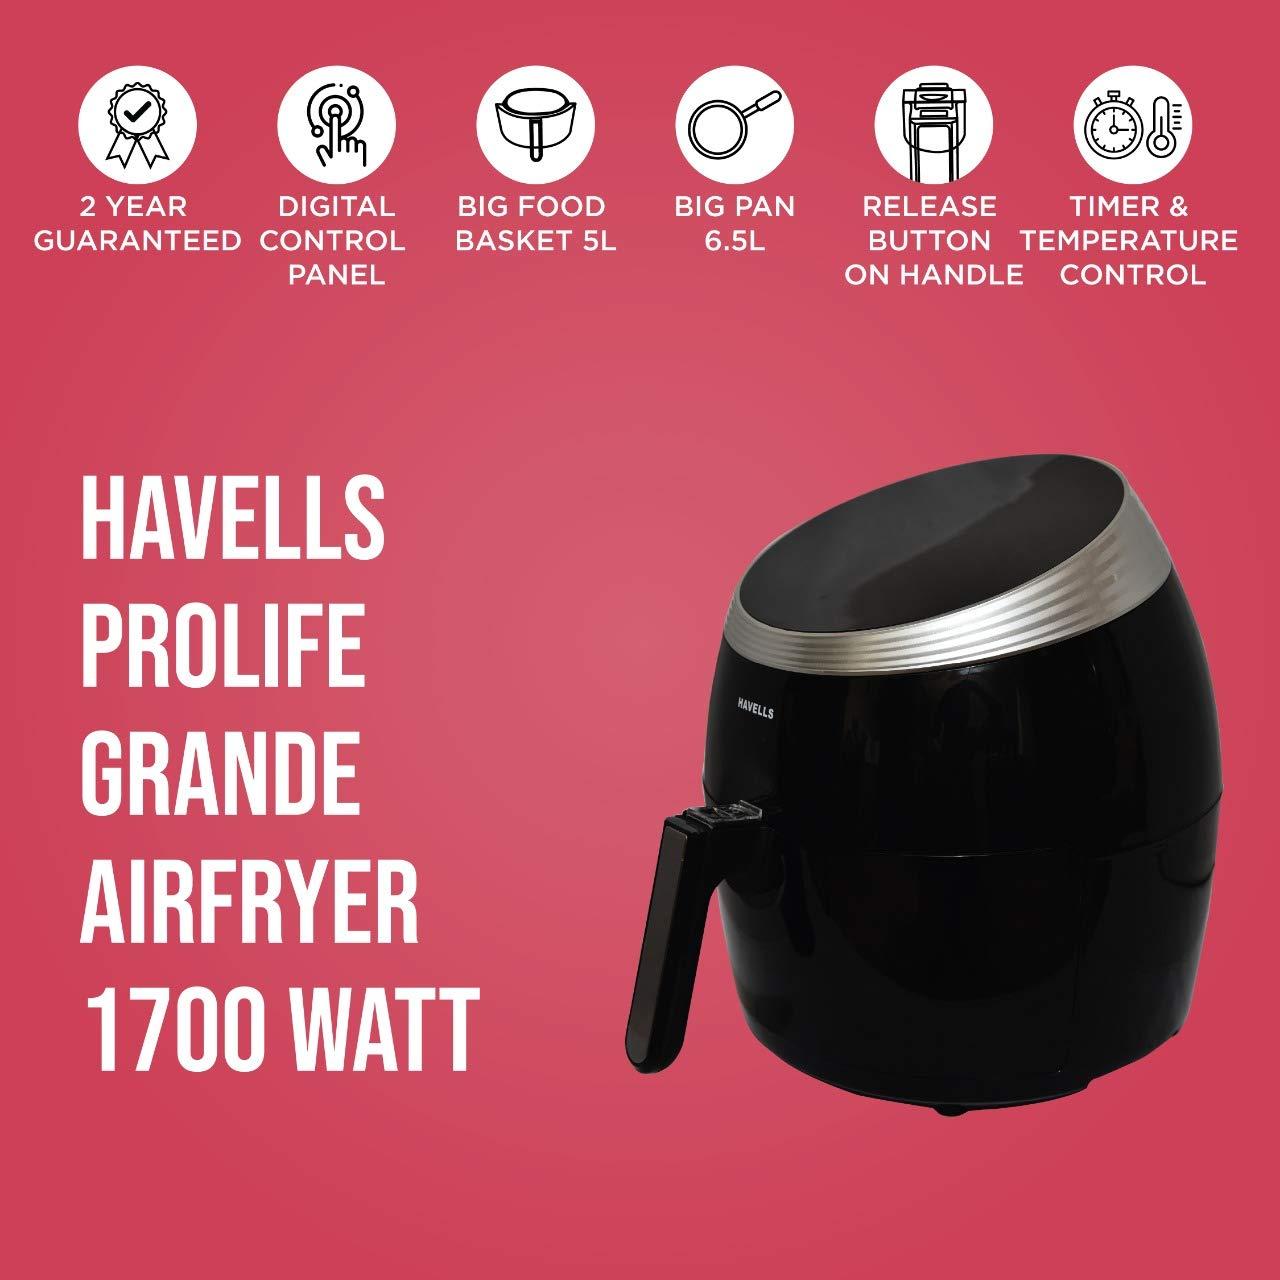 Havells air fryer: Havells prolife grande air fryer